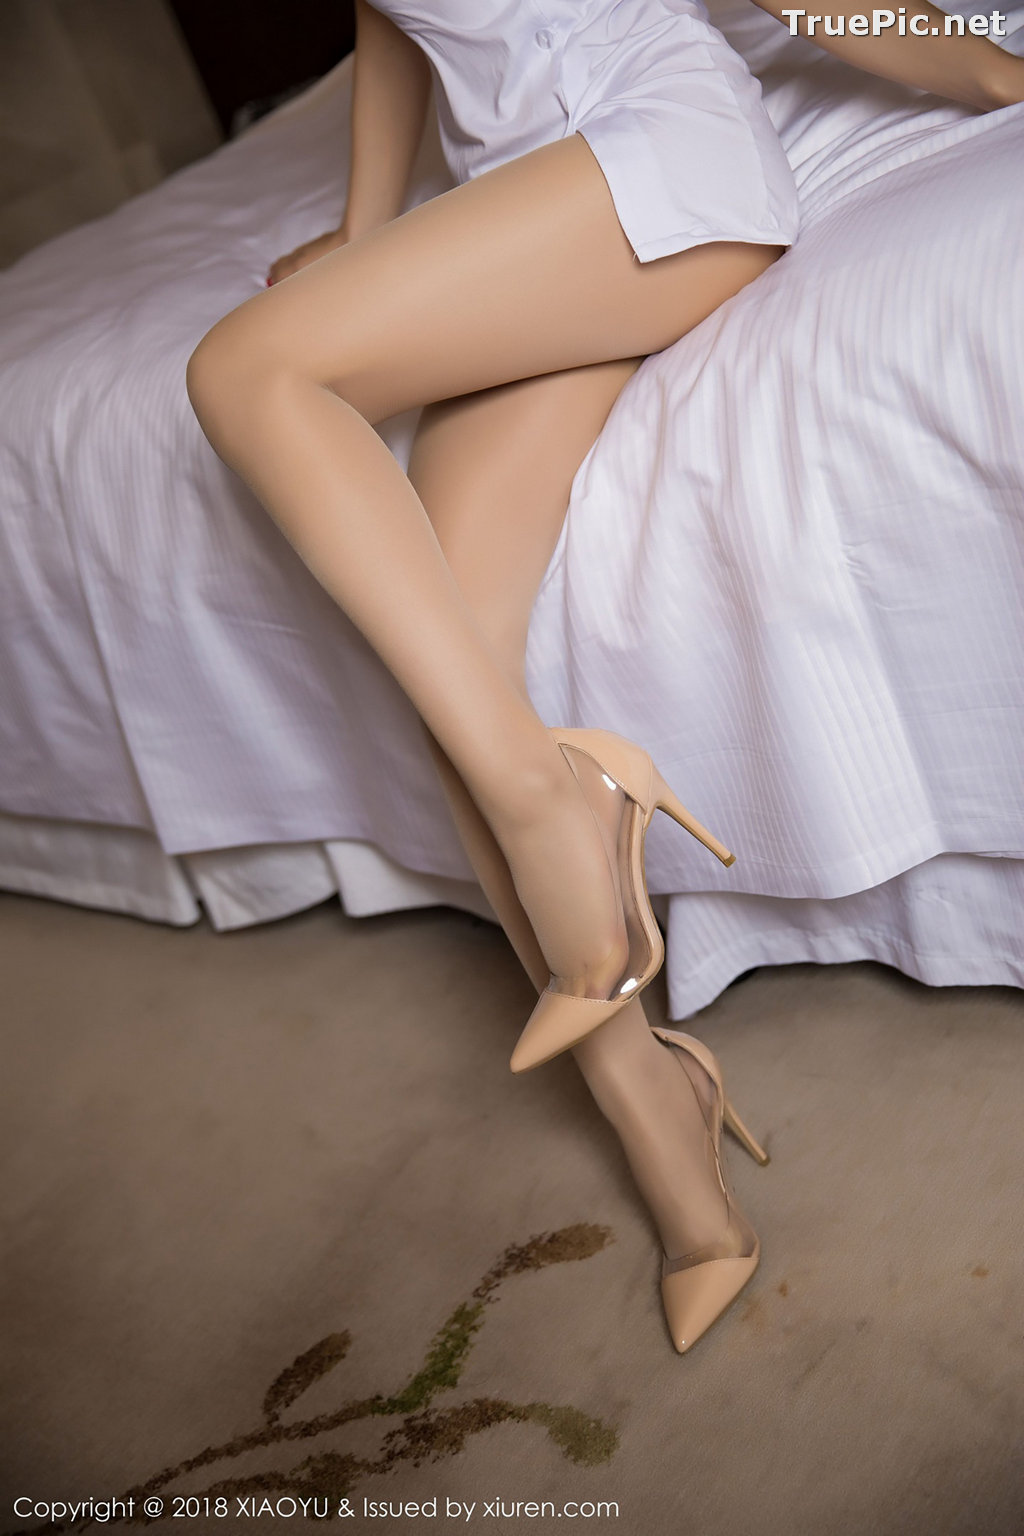 Image XiaoYu No.004 - Chinese Model - Xiao Reba (Angela喜欢猫) - White Sexy Nurse - TruePic.net - Picture-10